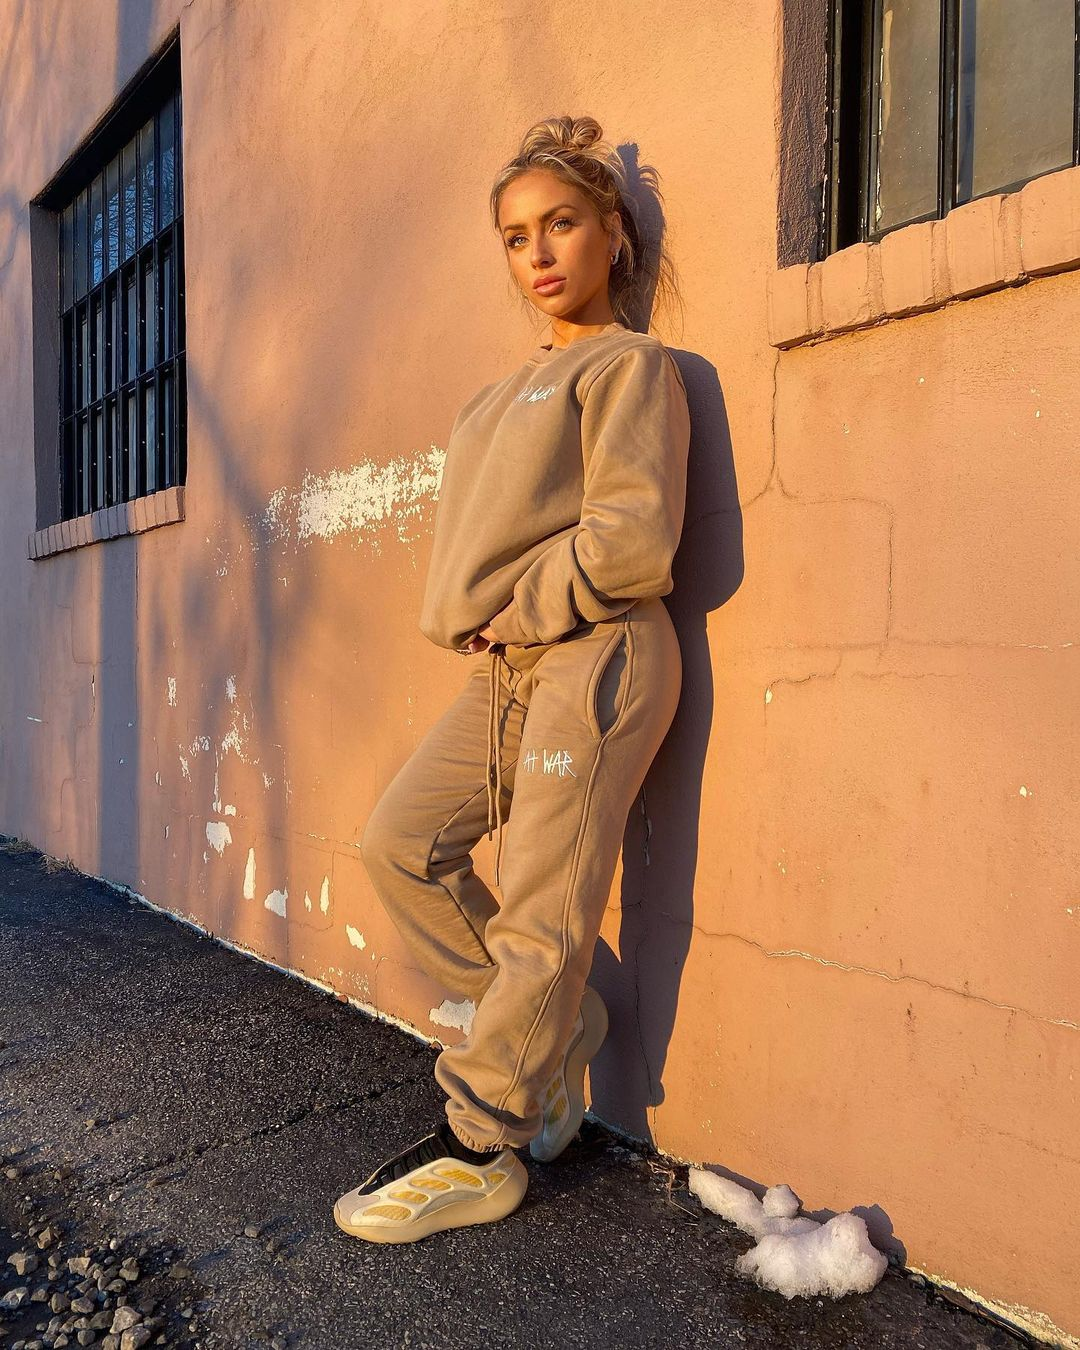 Stephanie-Weiss-Wallpapers-Insta-Fit-Bio-4